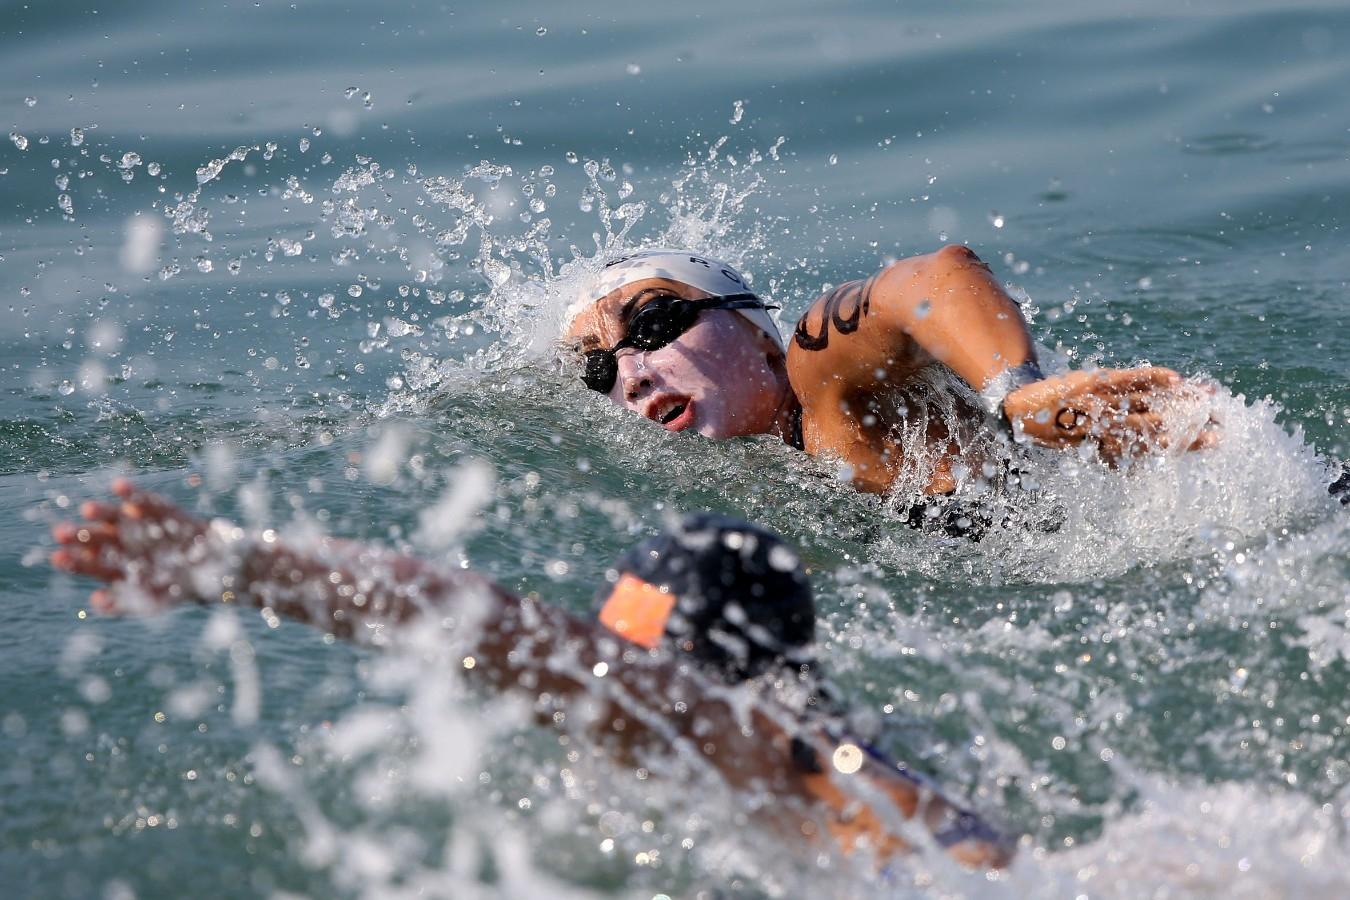 Poliano Okimoto. Copa do Mundo de Maratonas Aquaticas, etapa Travessia de Hong Kong na Repulse Bay . 18 de Outubro de 2014, Hong Kong. Foto: Satiro Sodre/SSPress.